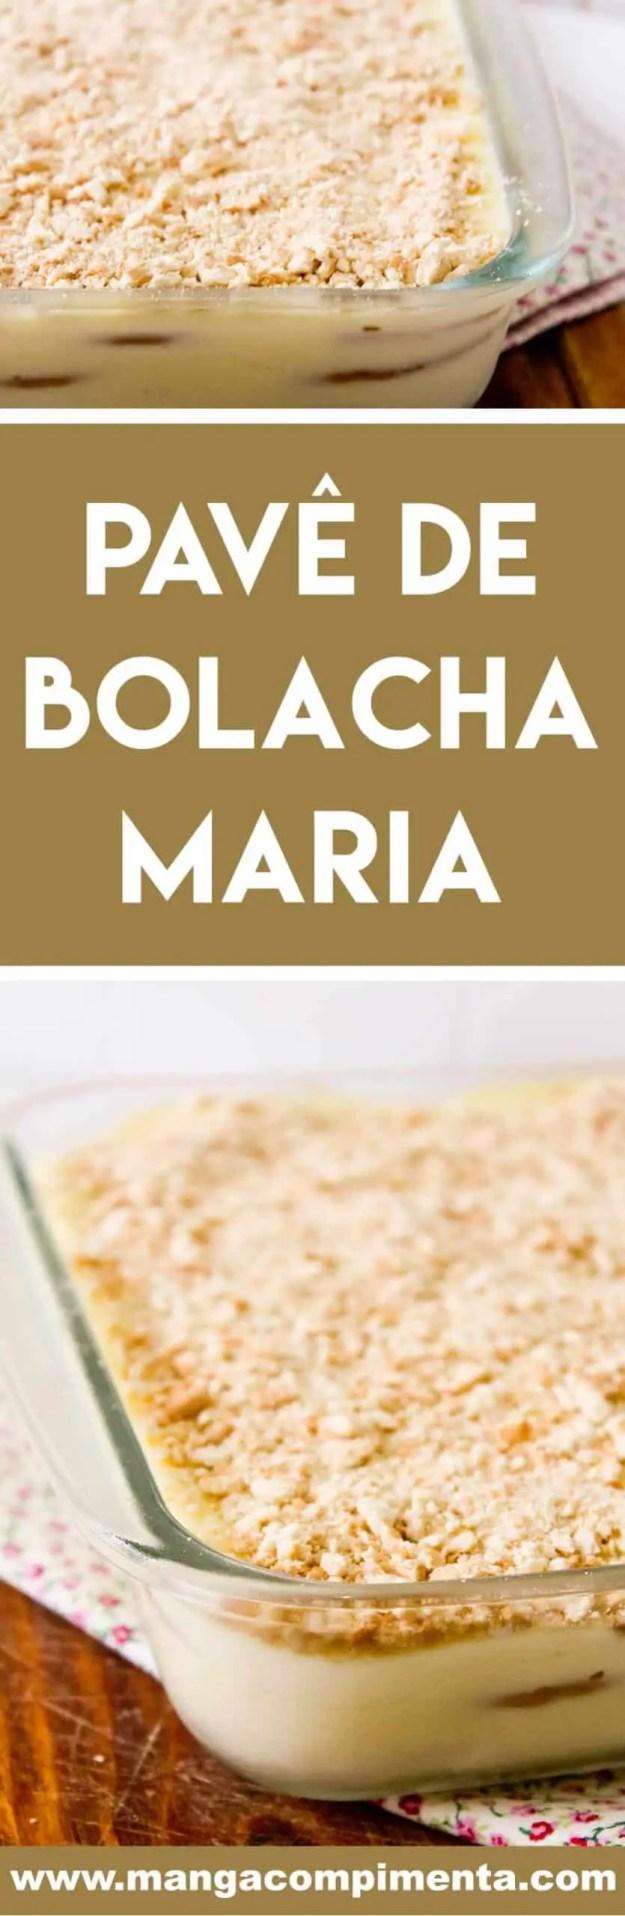 Receita Pavê de Bolacha Maria - sobremesa fácil para o final de semana ou para as festas de final de ano!